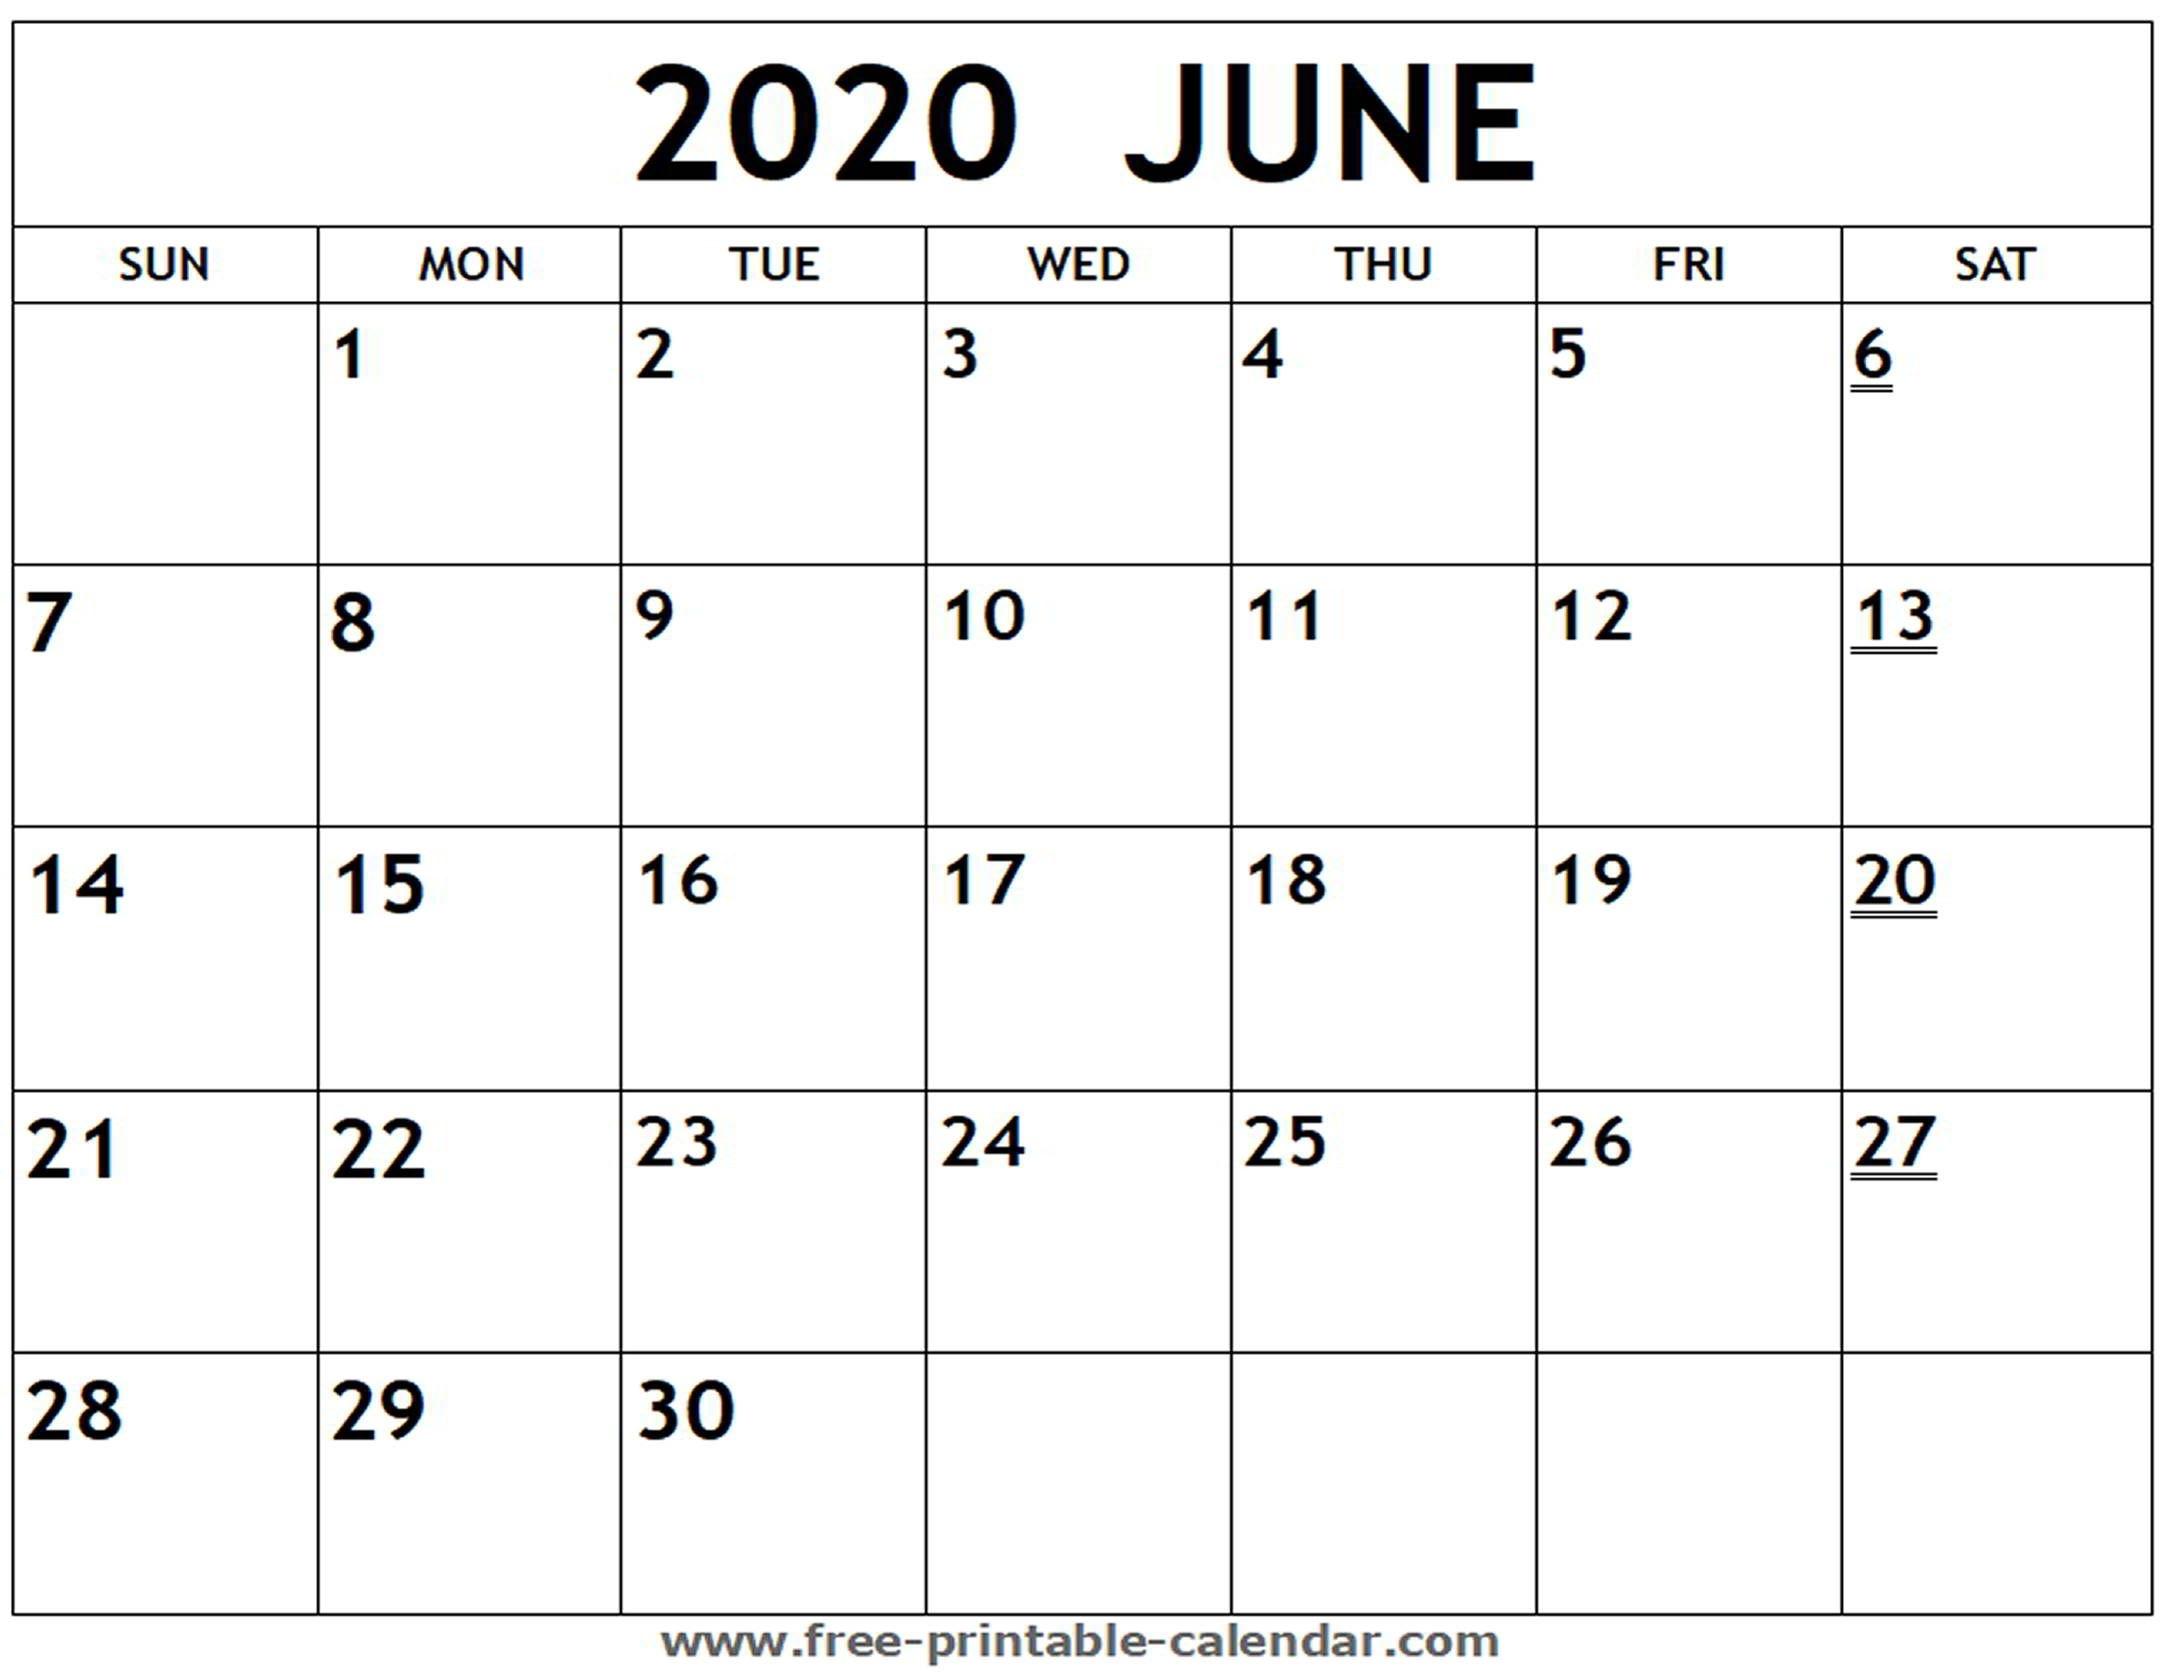 Printable 2020 June Calendar - Free-Printable-Calendar